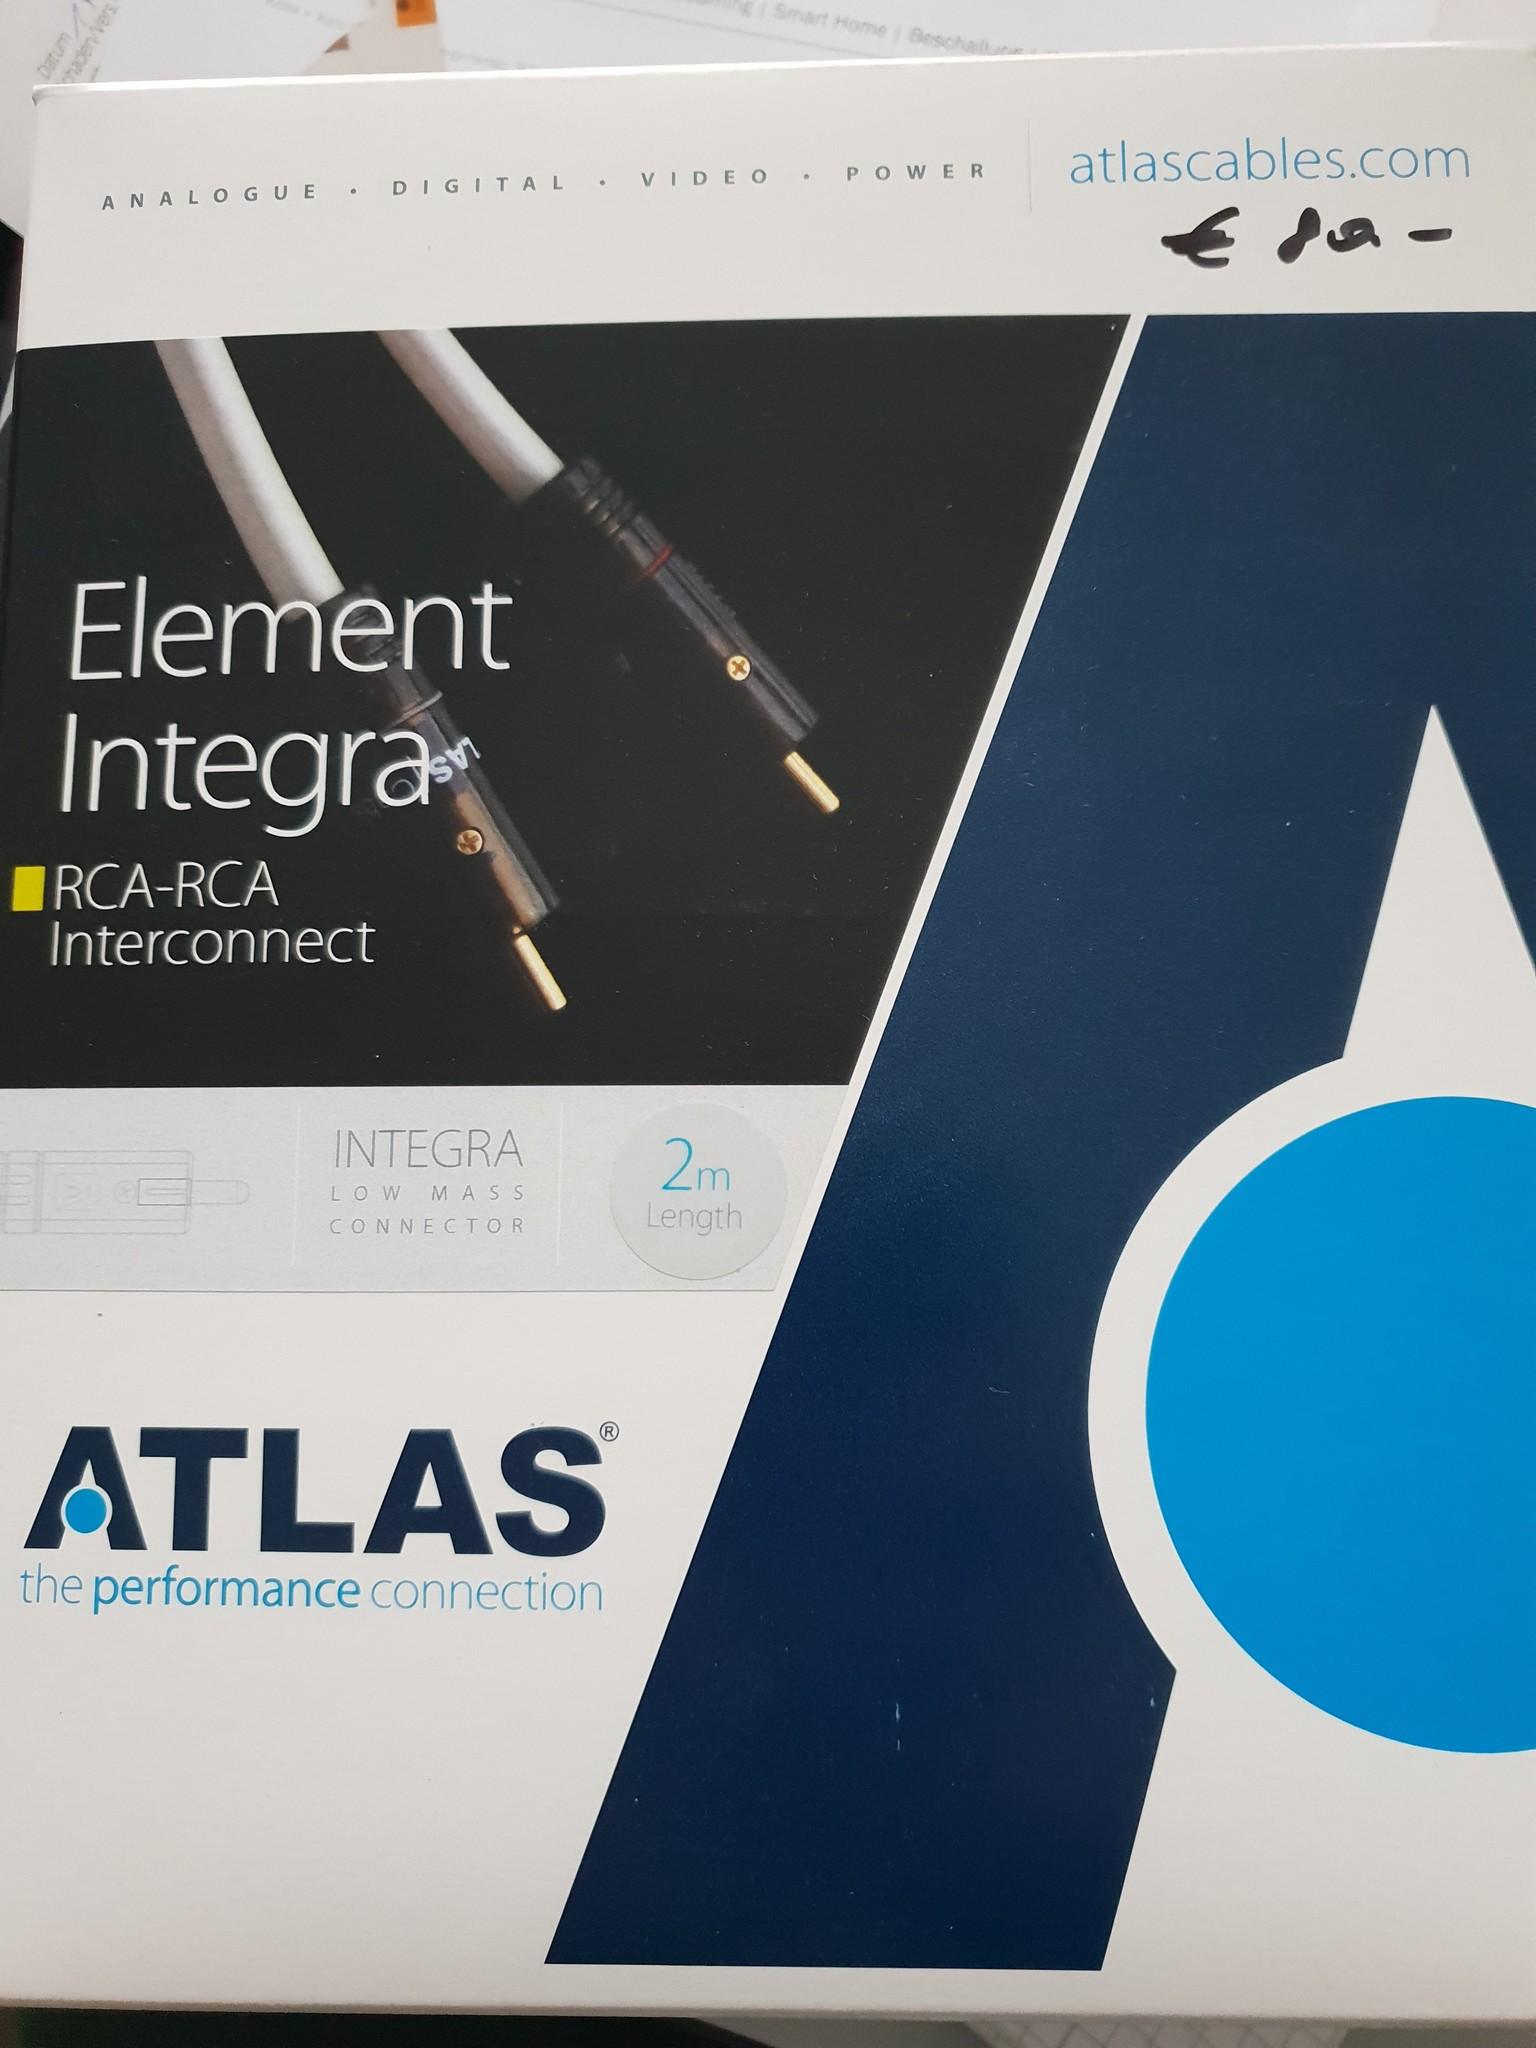 Atlas Atlas Element Integra RCA-RCA Interconnect 2m